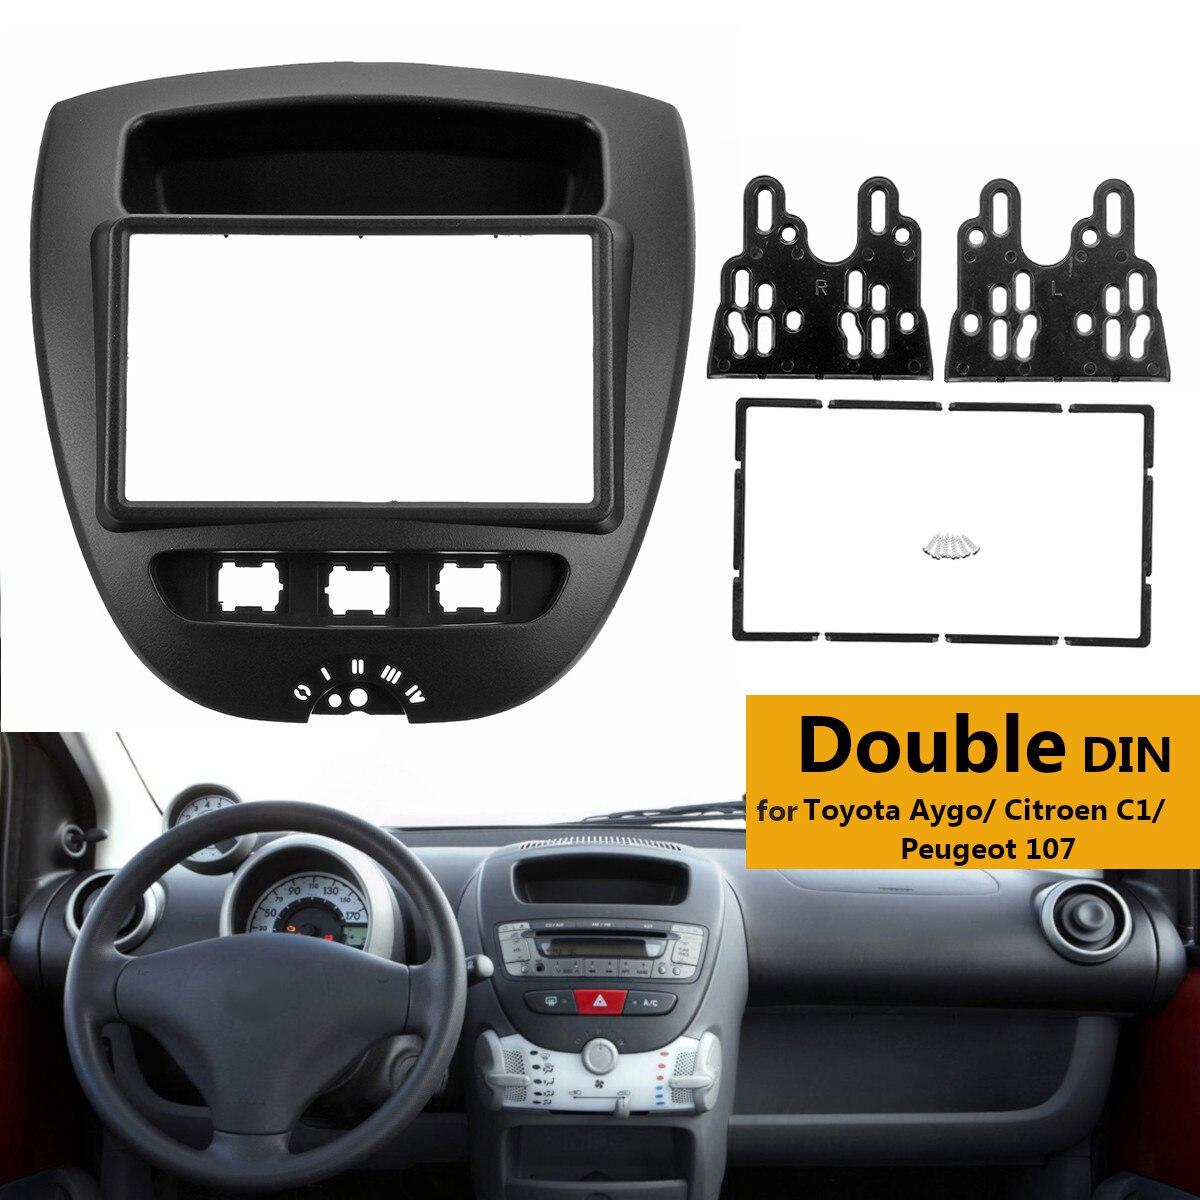 все цены на 2 Din Car Stereo Radio Fascia Panel Plate Frame CD Panel Dashboard Audio Frame for Toyota Aygo for Citroen C1 for Peugeot 107 онлайн